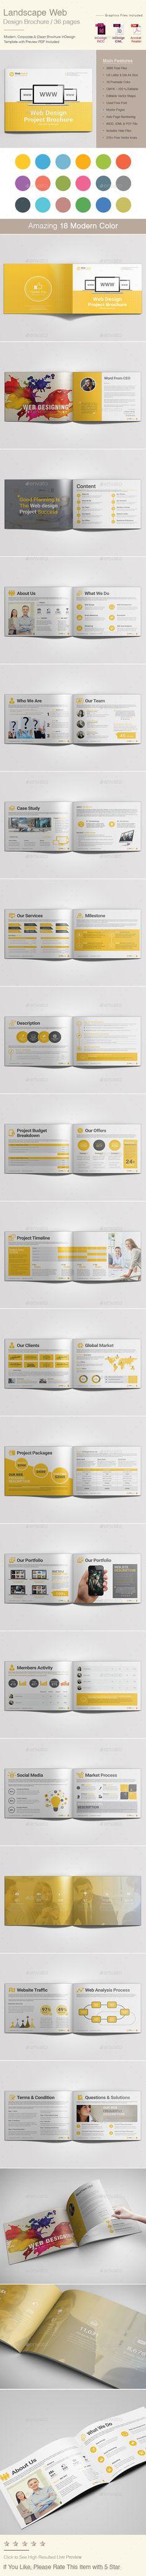 Landscape Web Design Brochure Brochure Template for